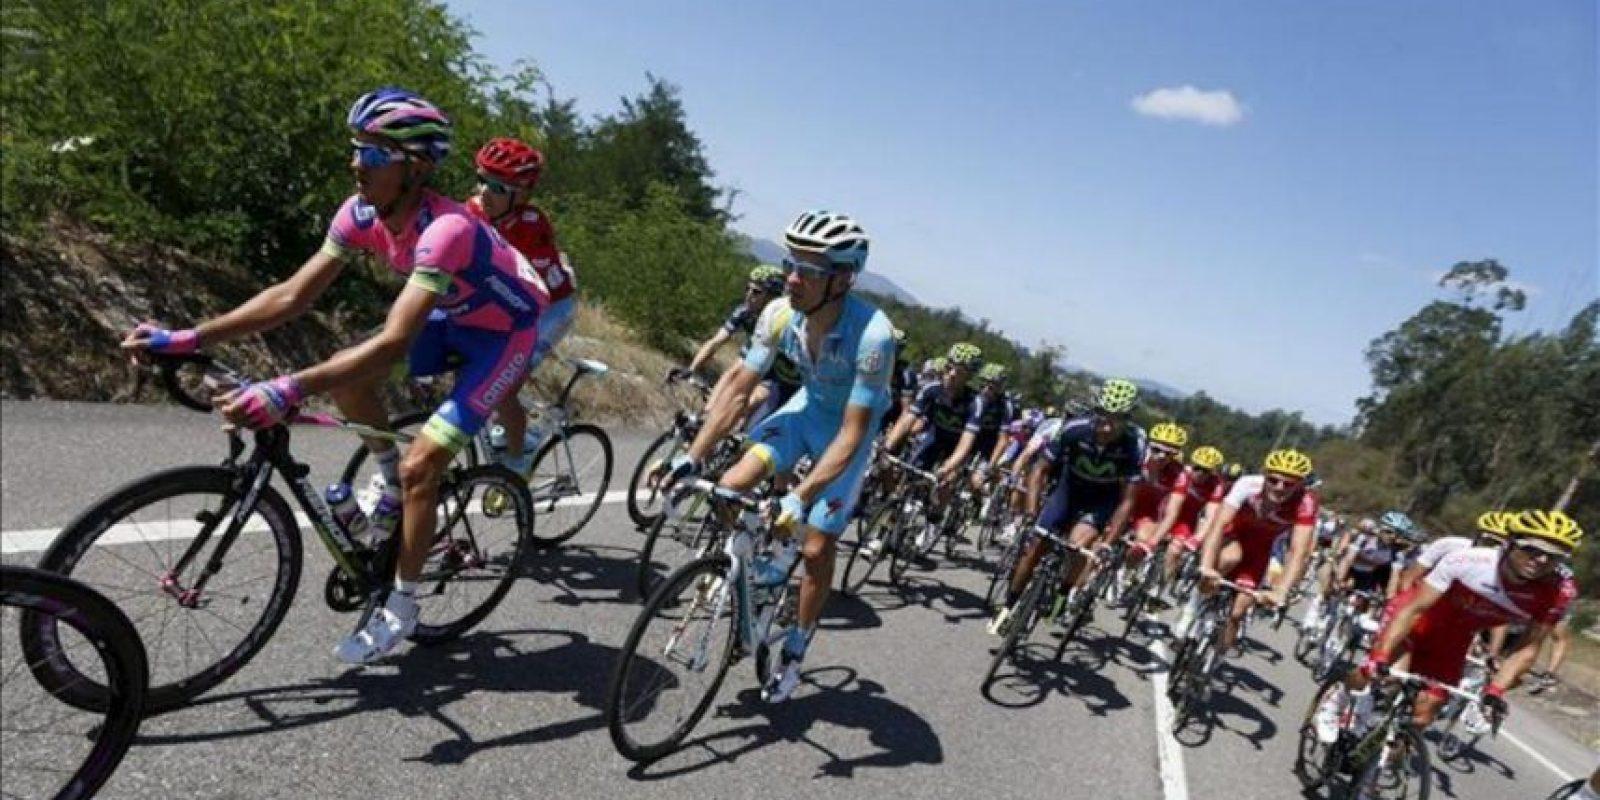 El pelotón durante la segunda etapa de la Vuelta Ciclista a España, celebrada desde Pontevedra a Baiona-Alto do Monte da Groba. EFE